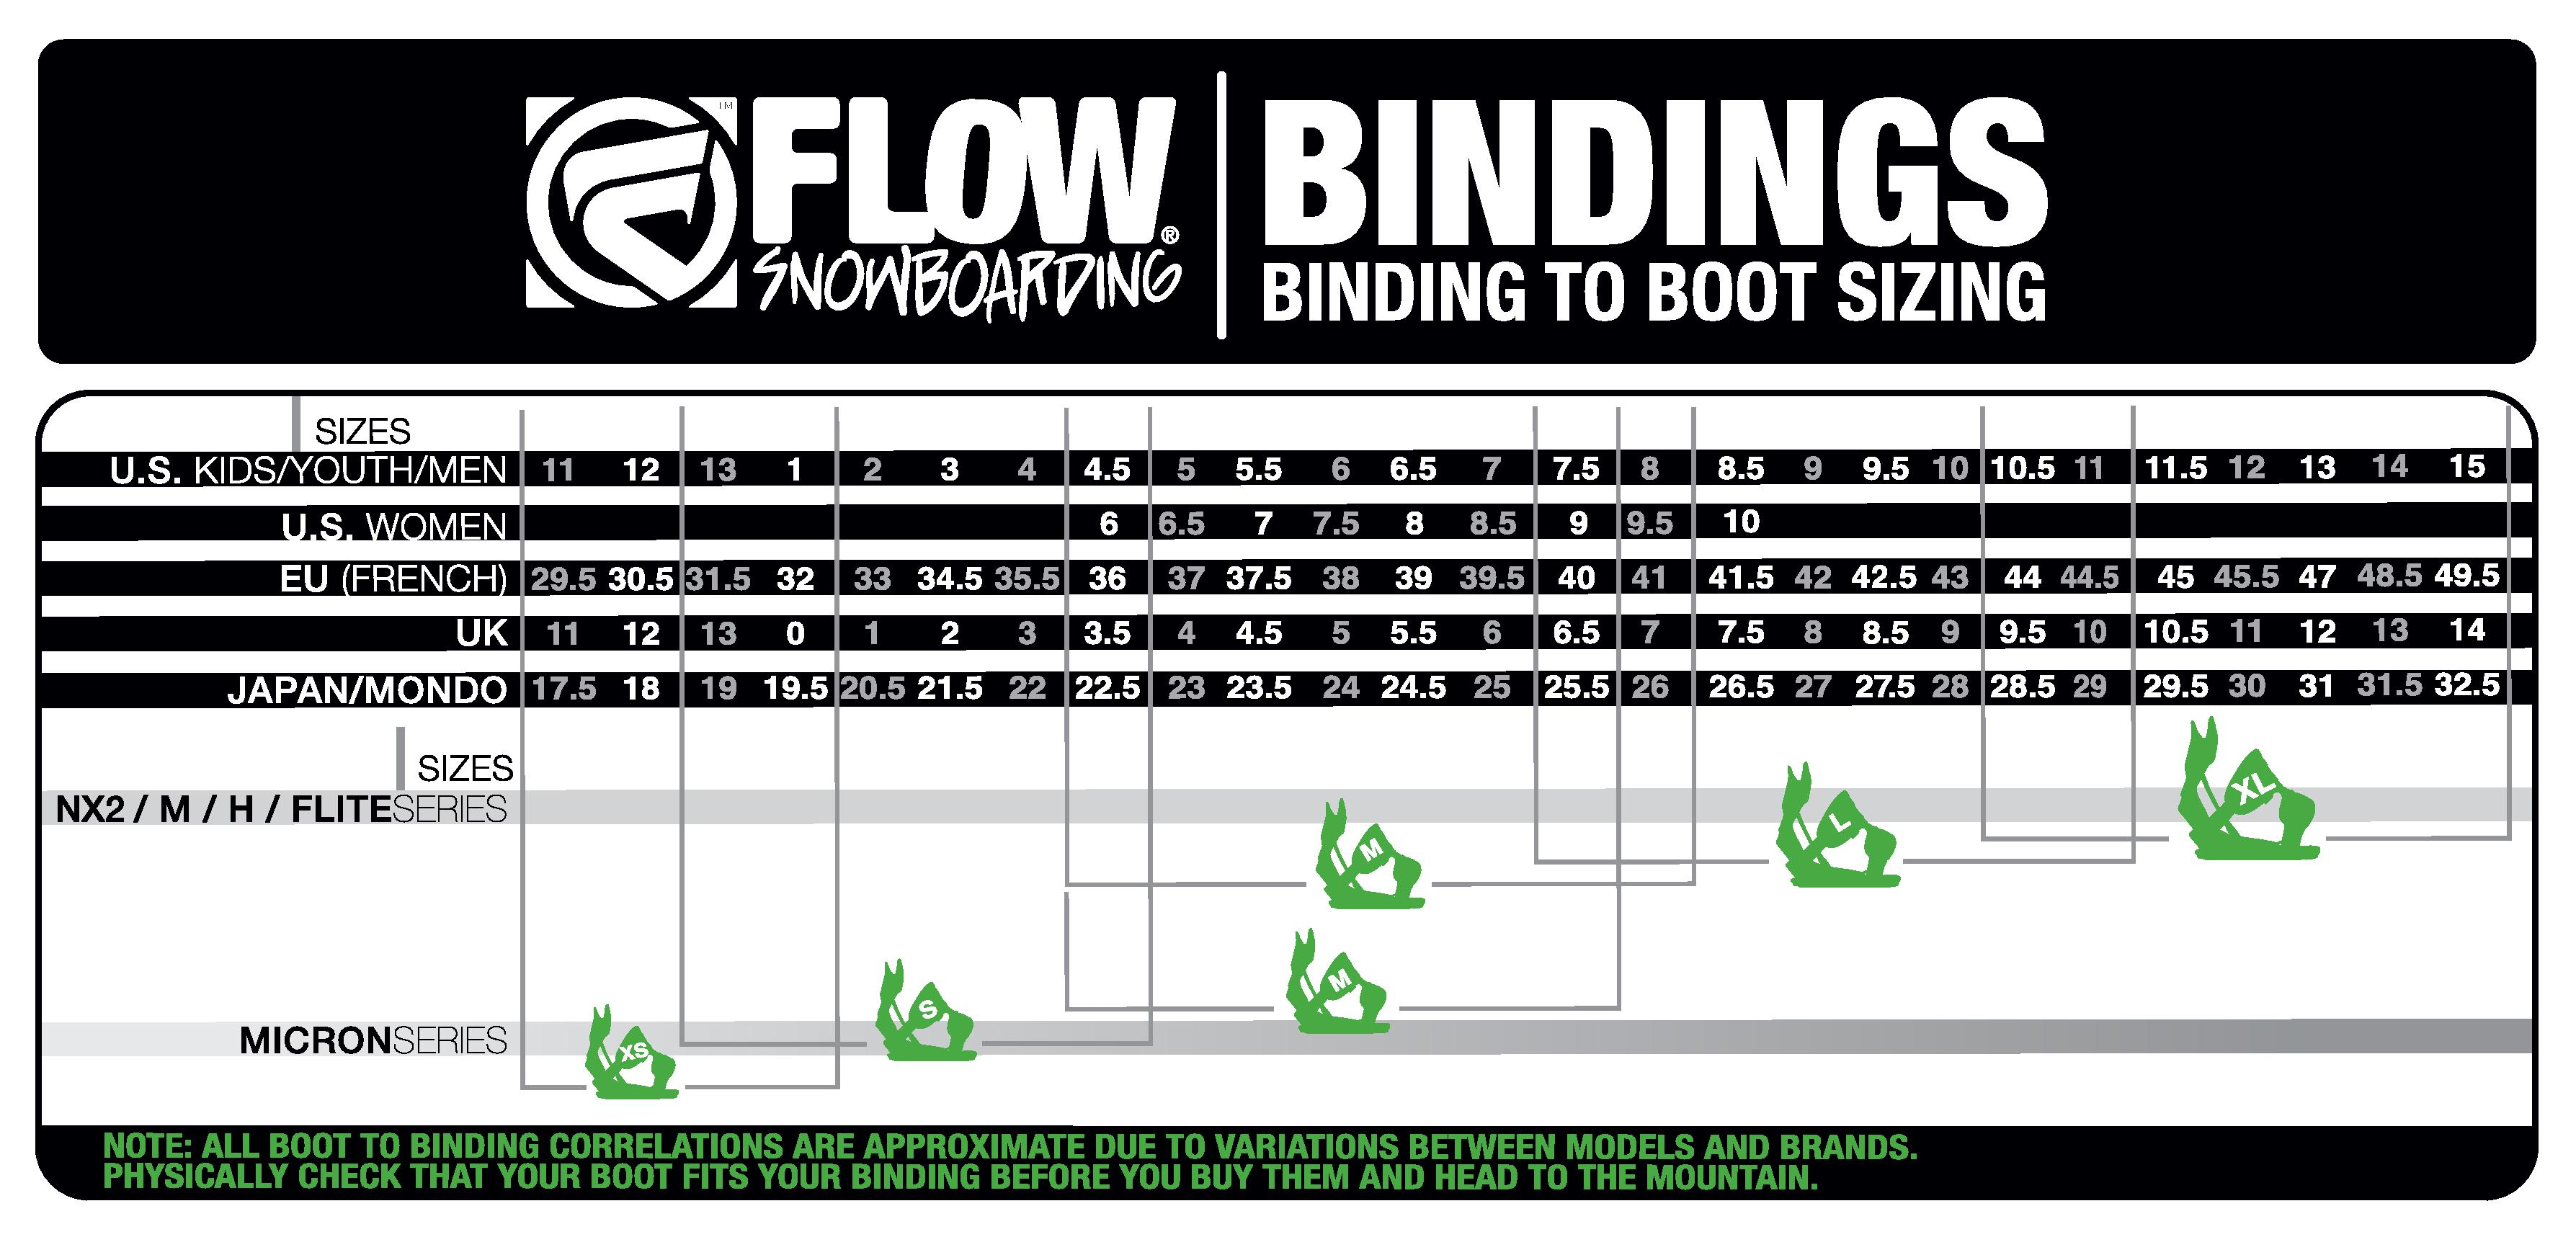 Flow bindings size chart snowboard binding size chart flow image